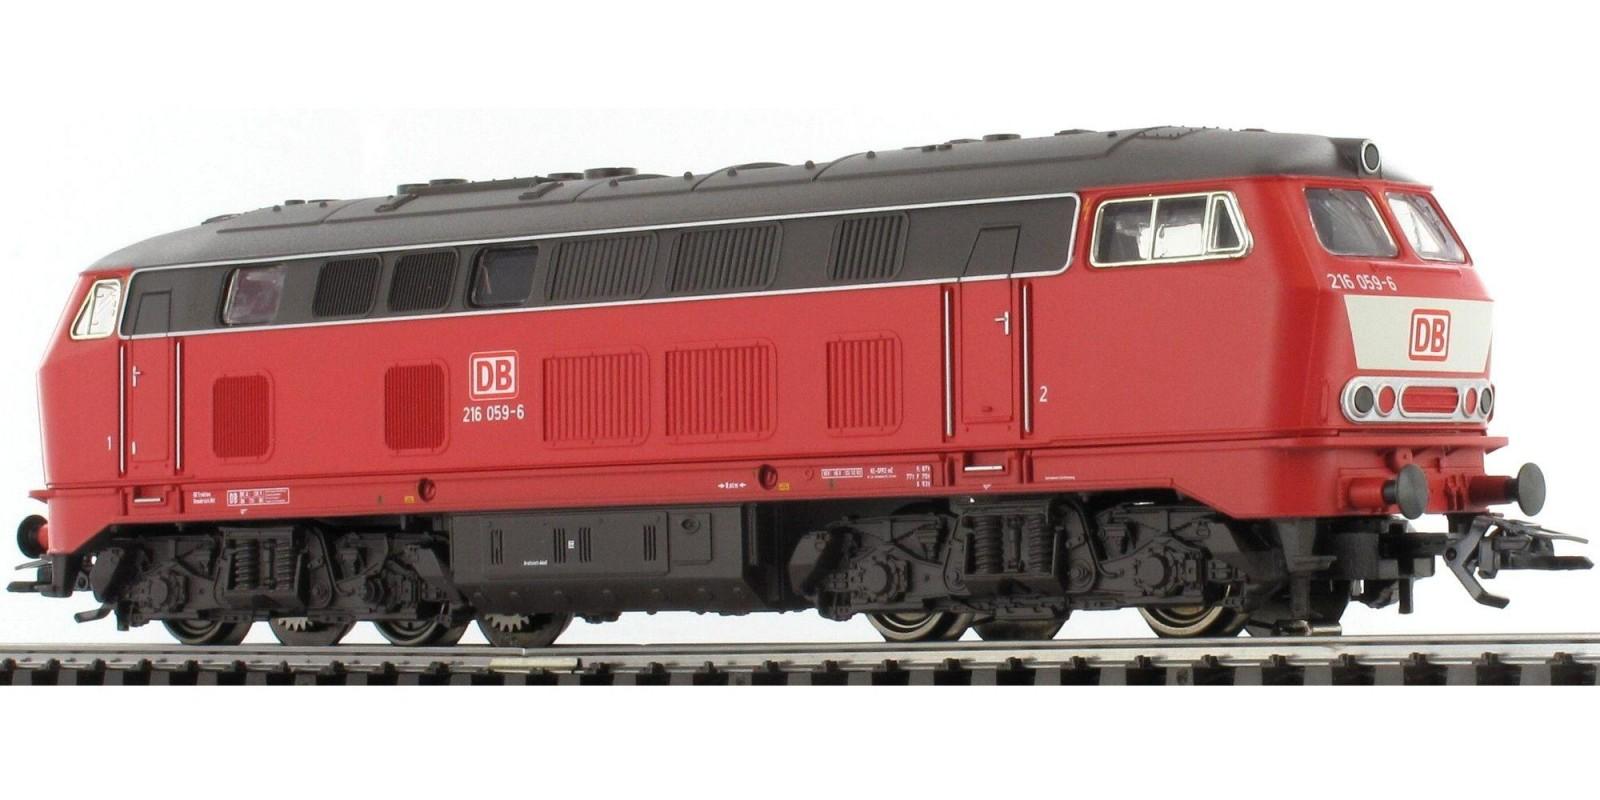 29060_01 Diesel Locomotive BR216 from Starter Set 29060